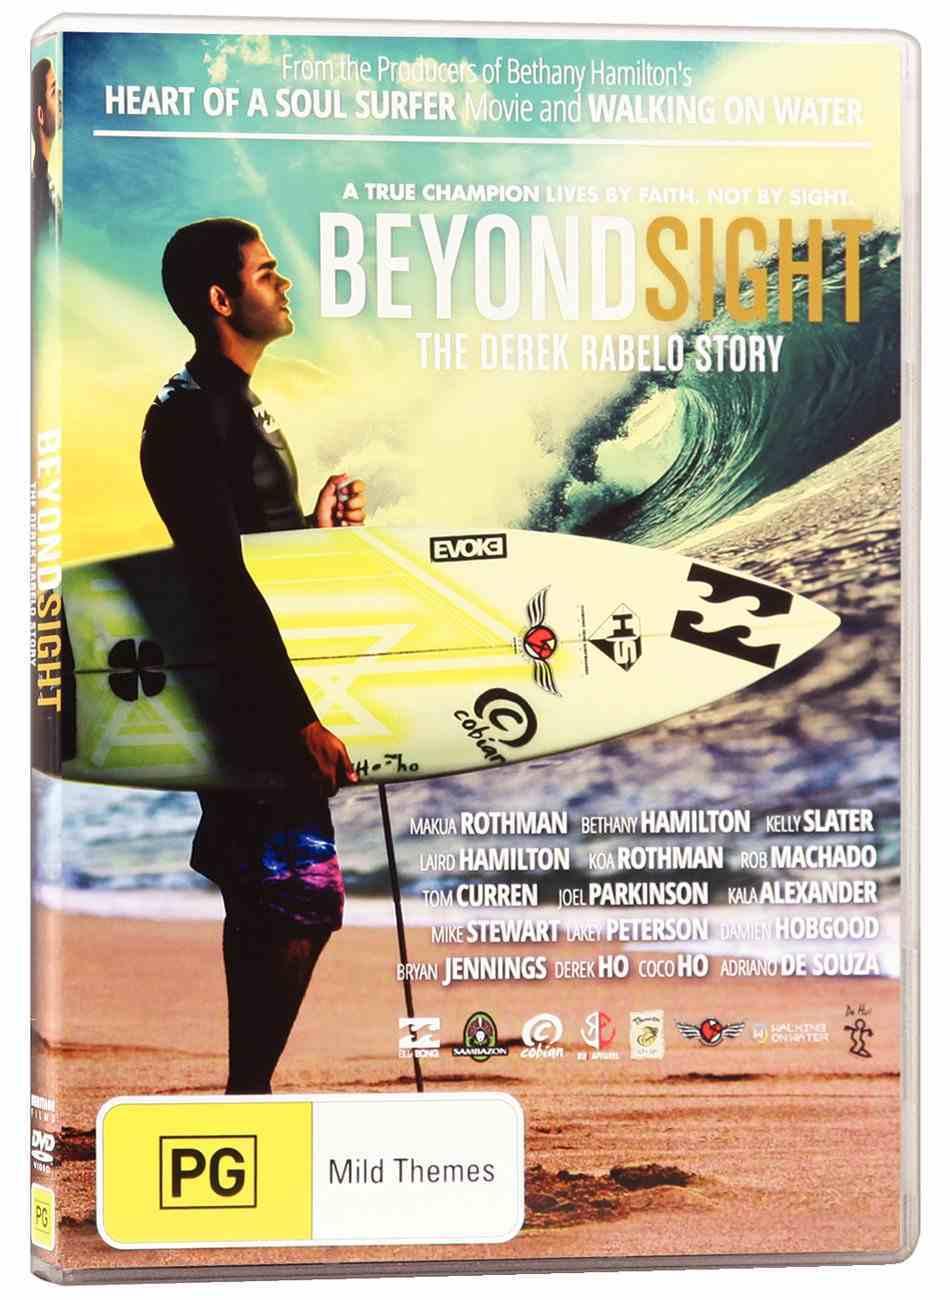 Beyond Sight: The Derek Rabelo Story DVD